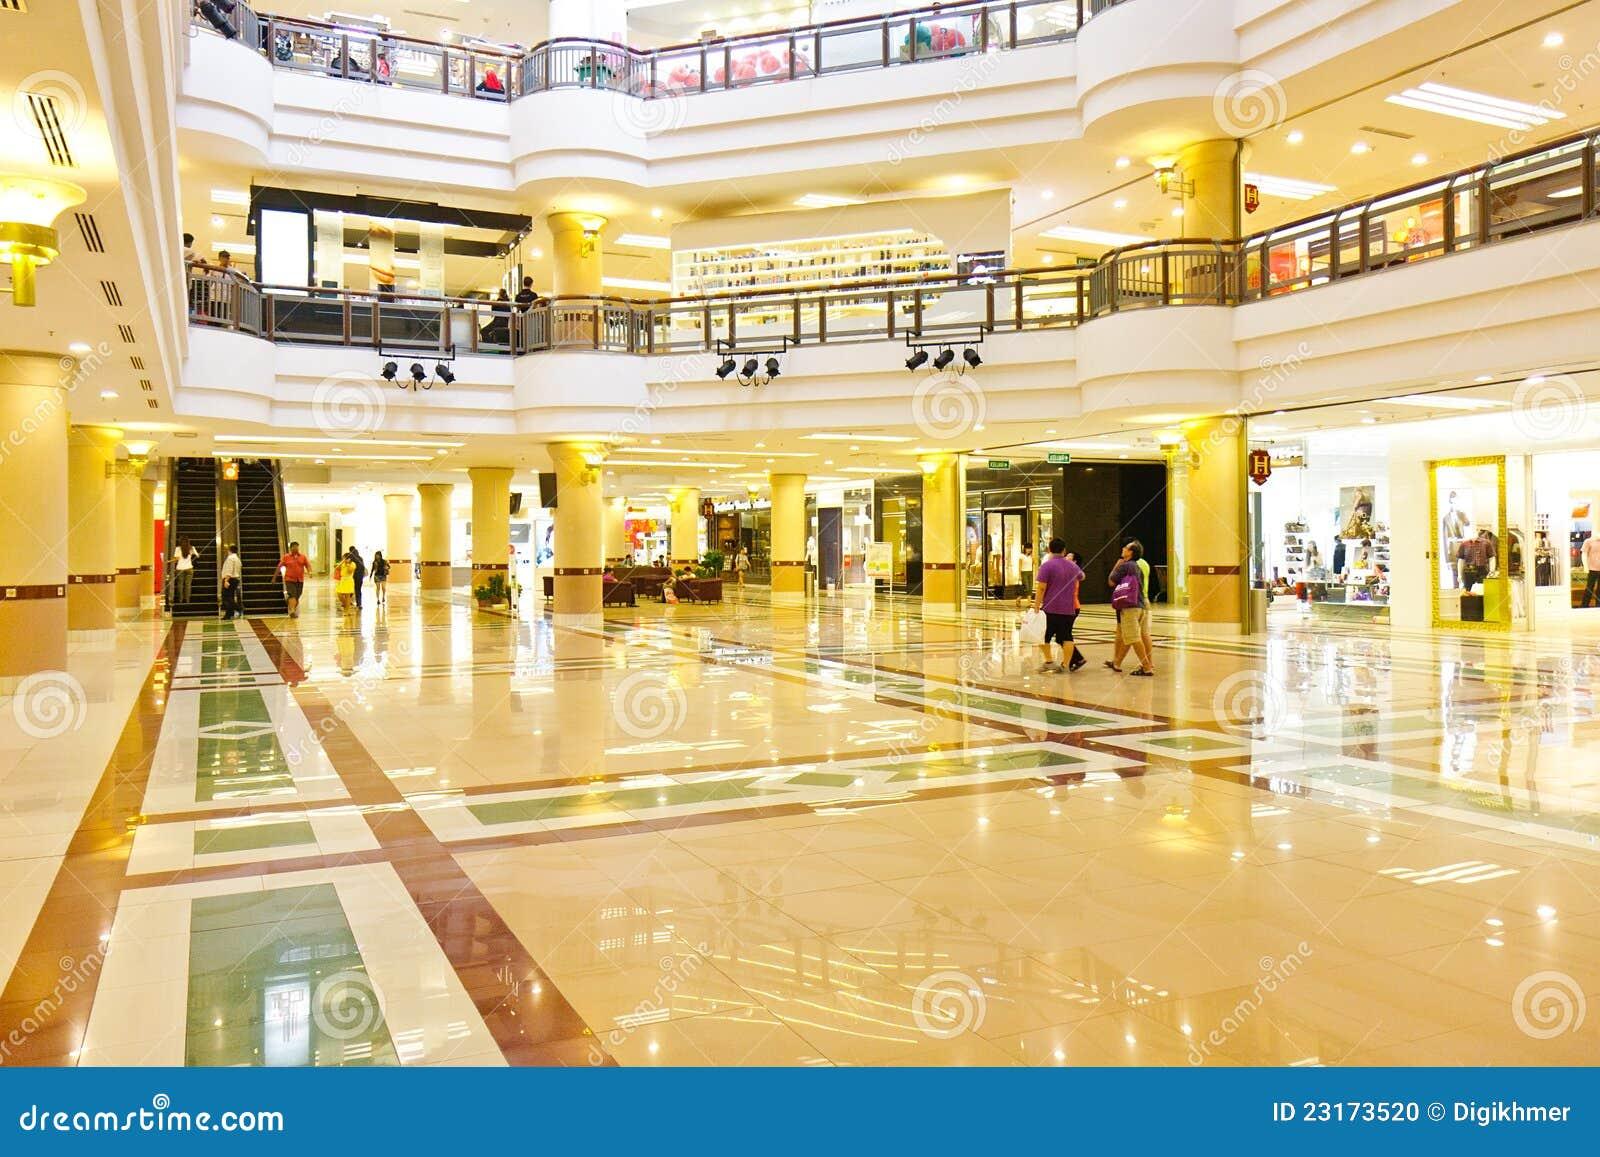 Shopping Mall 1utama Malaysia Editorial Image Image